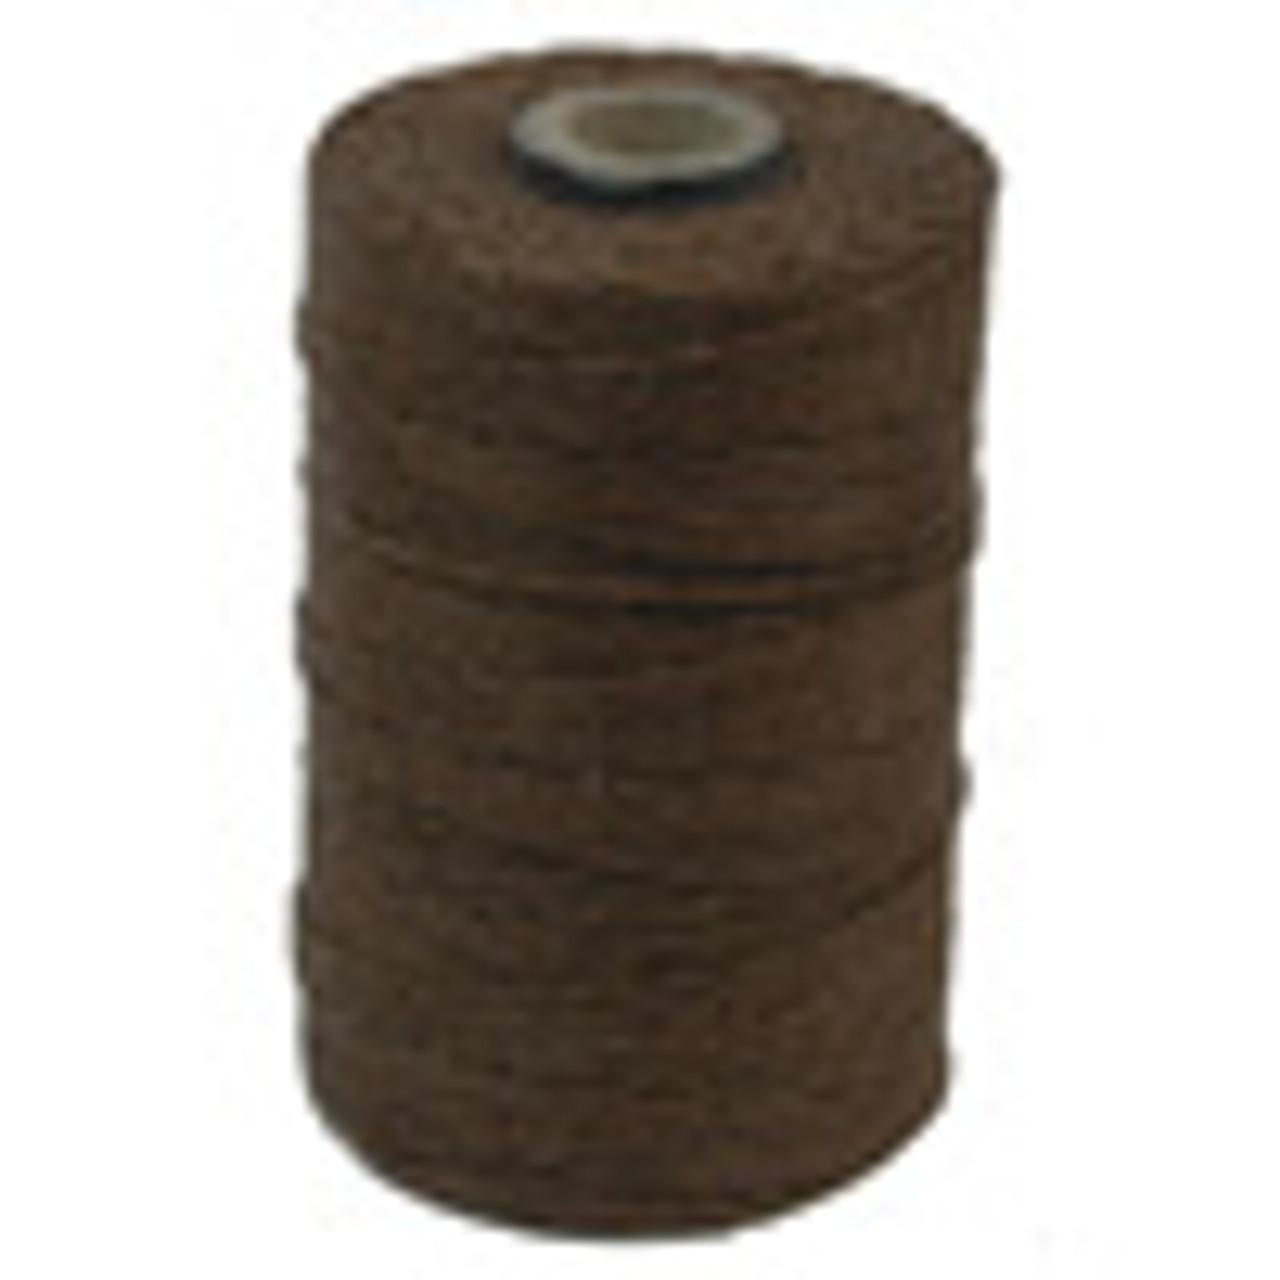 Walnut Brown 4ply Irish Waxed Linen (10 Yards)